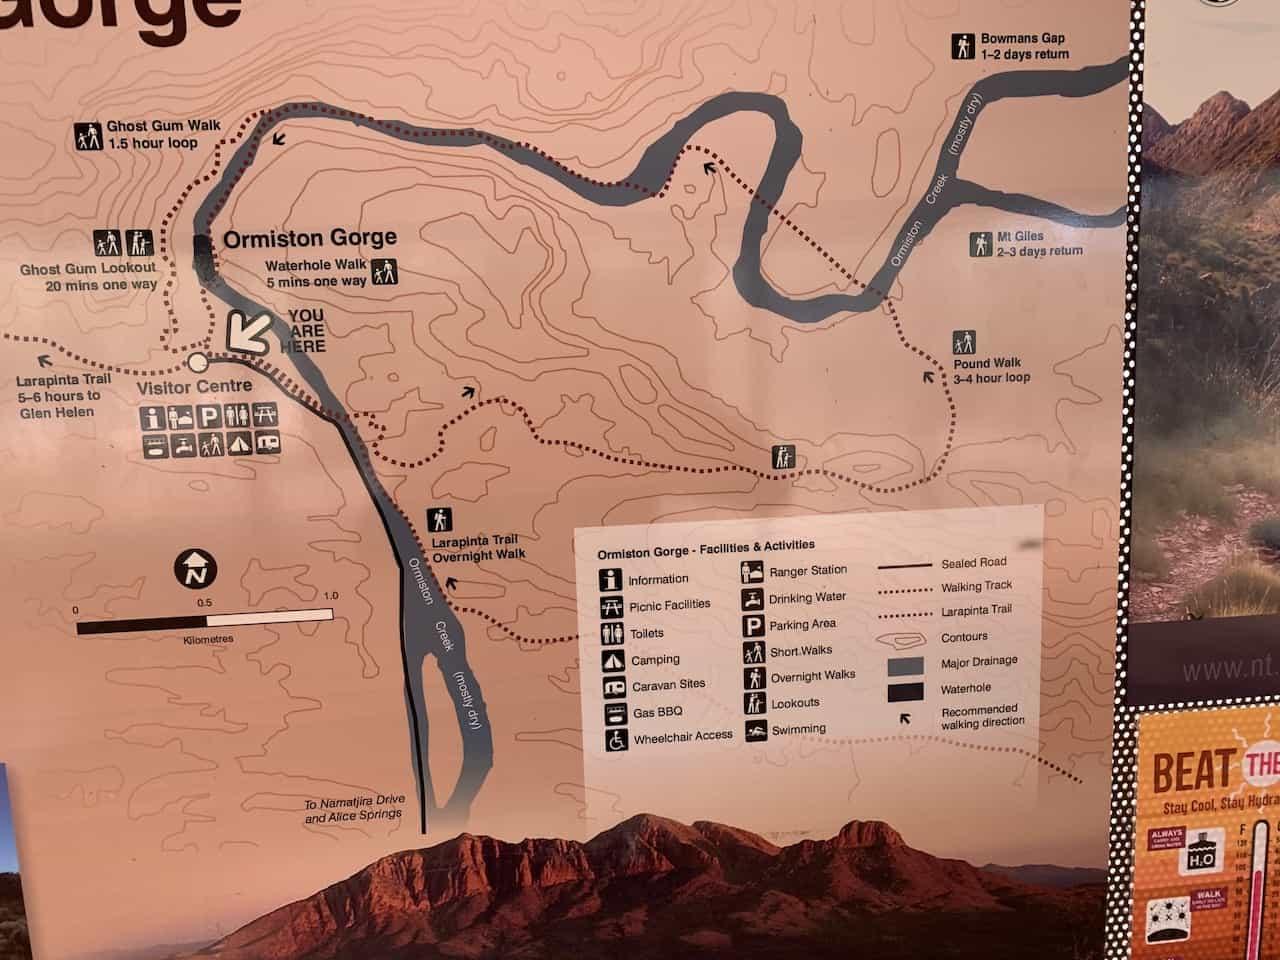 Ormiston Gorge Map